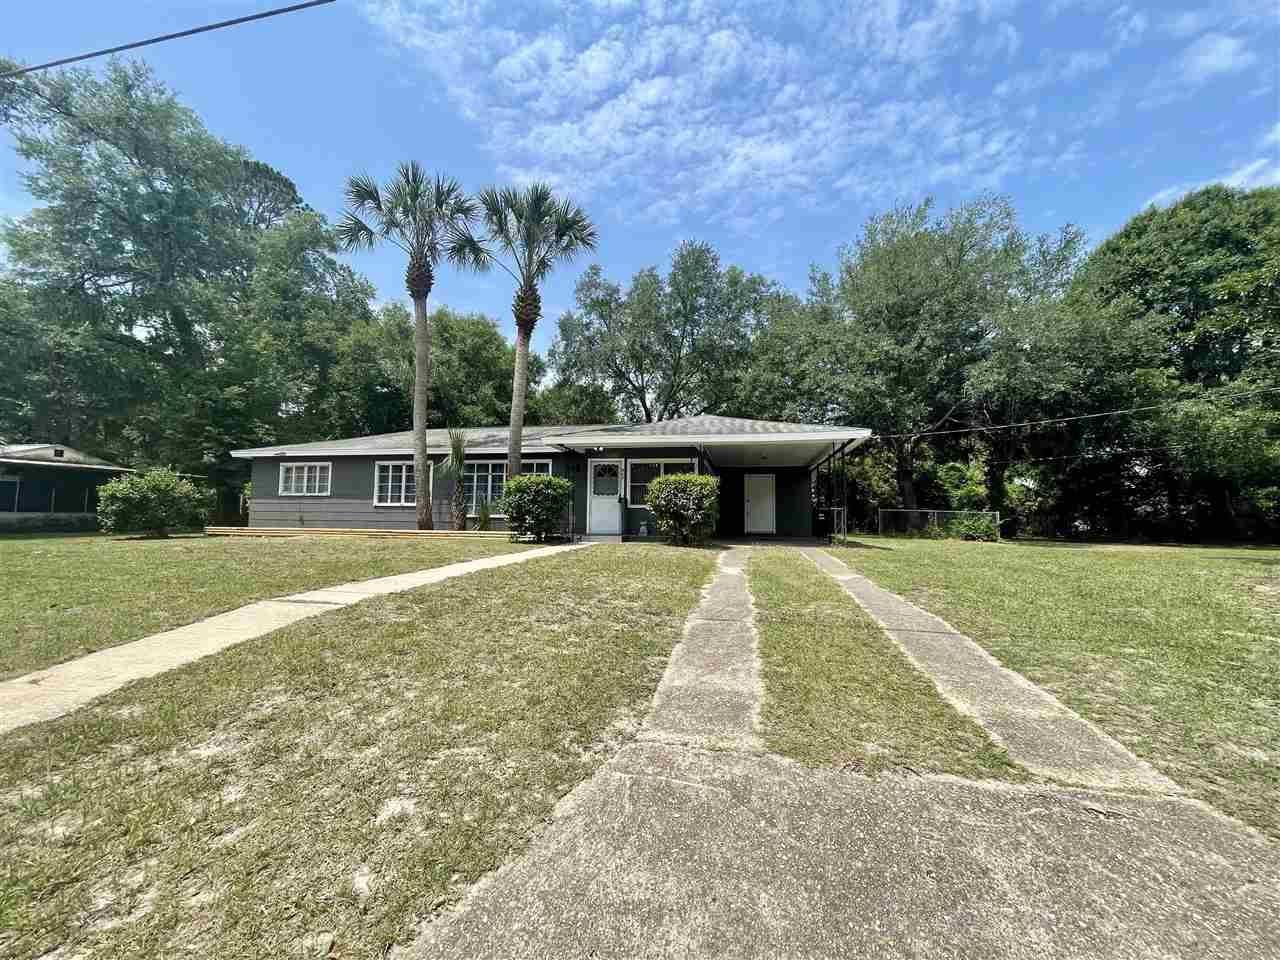 Photo of 807 E Cherry Street, PERRY, FL 32347 (MLS # 331733)